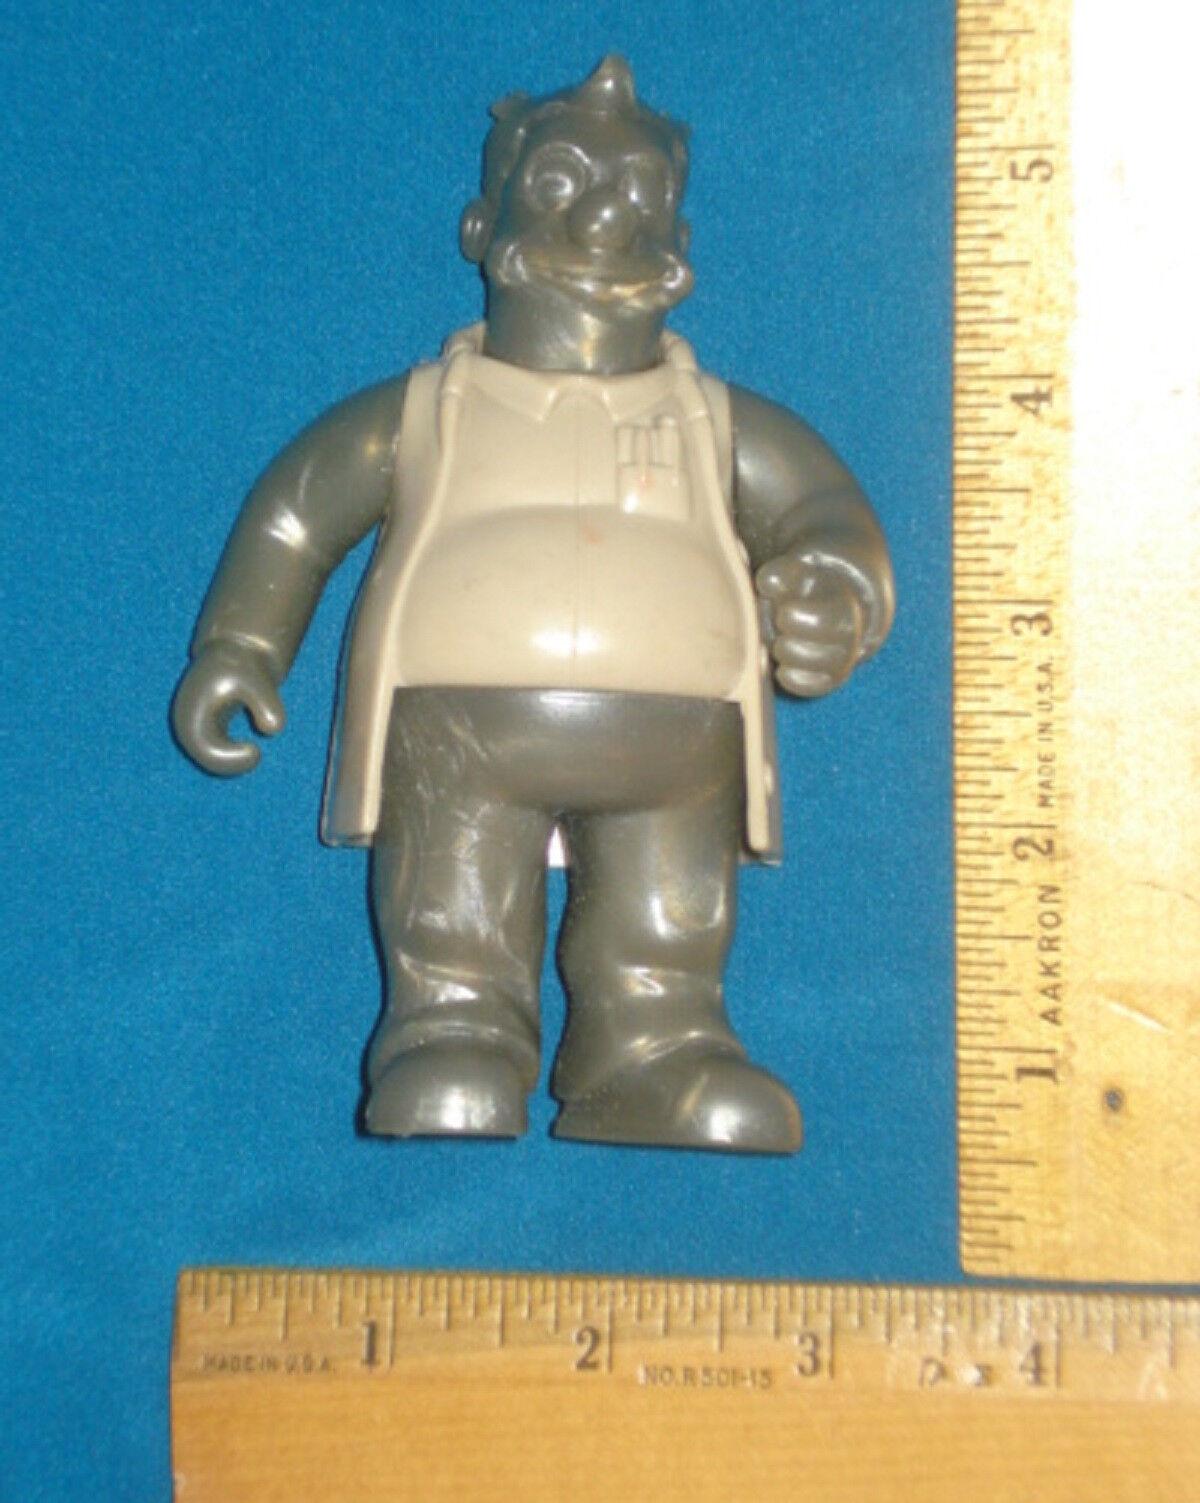 Prototype Test Shot Figure Playmates Simpsons 04 Doug Wave 16 No Copy Rights  V2